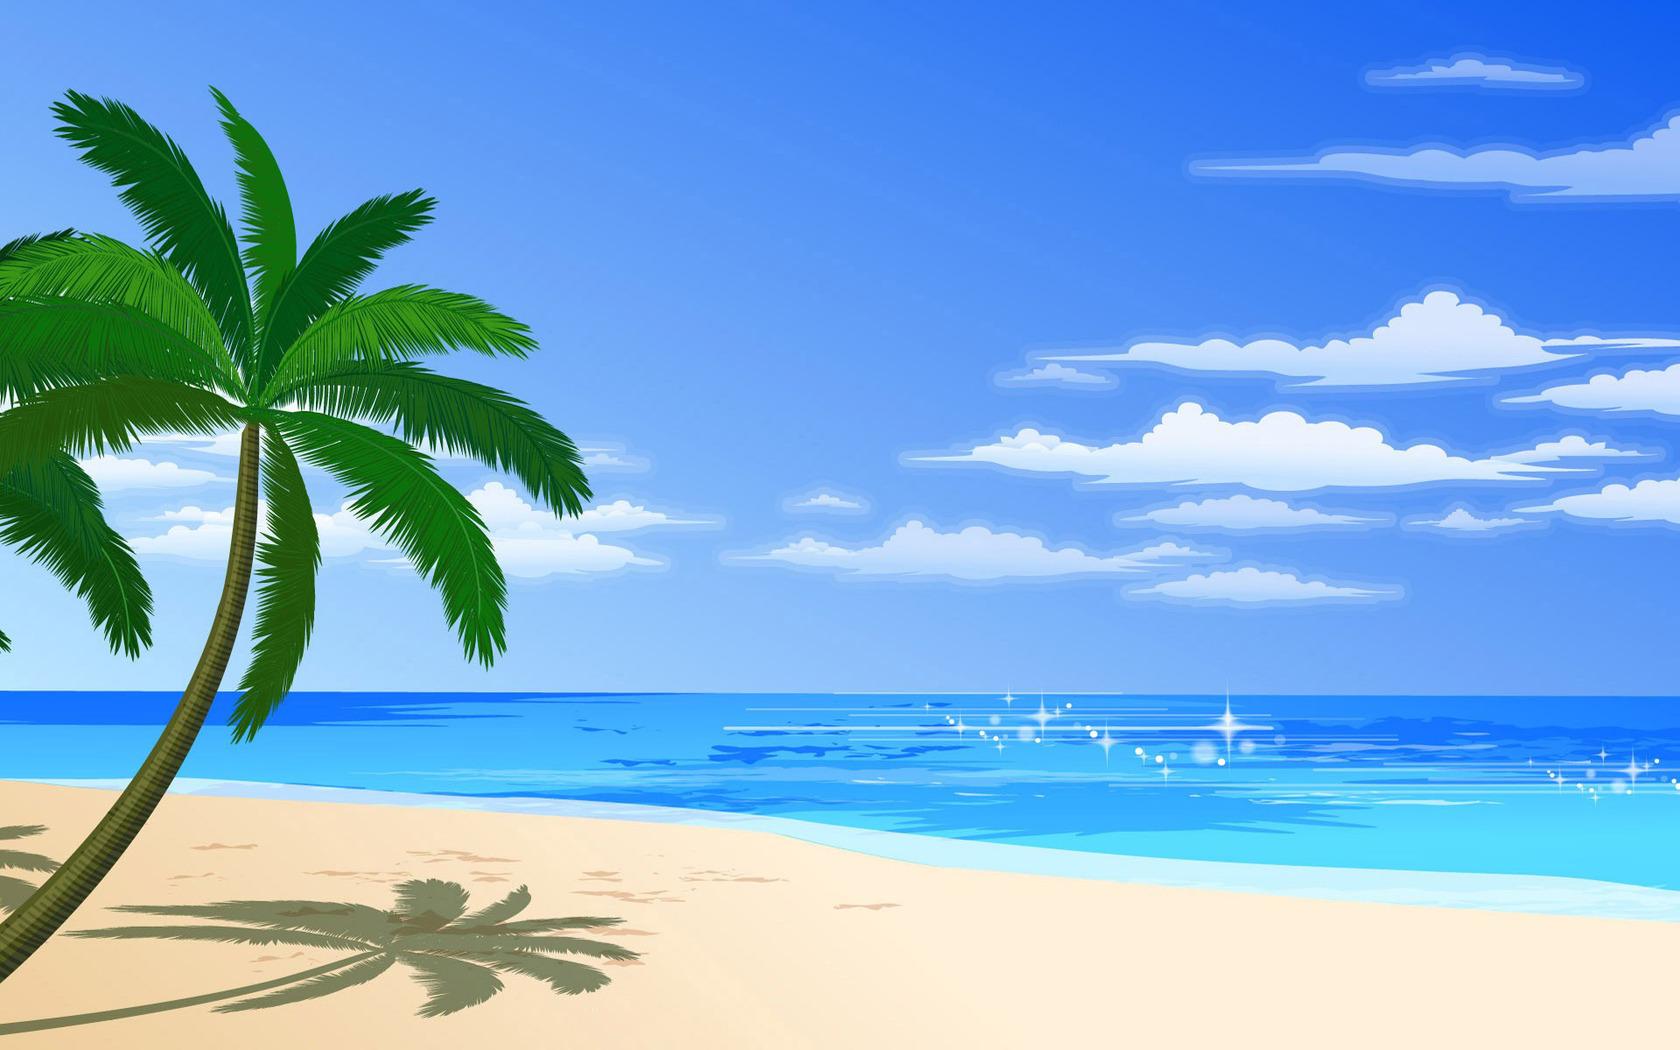 Single palm tree wallpaper 14296 1680x1050